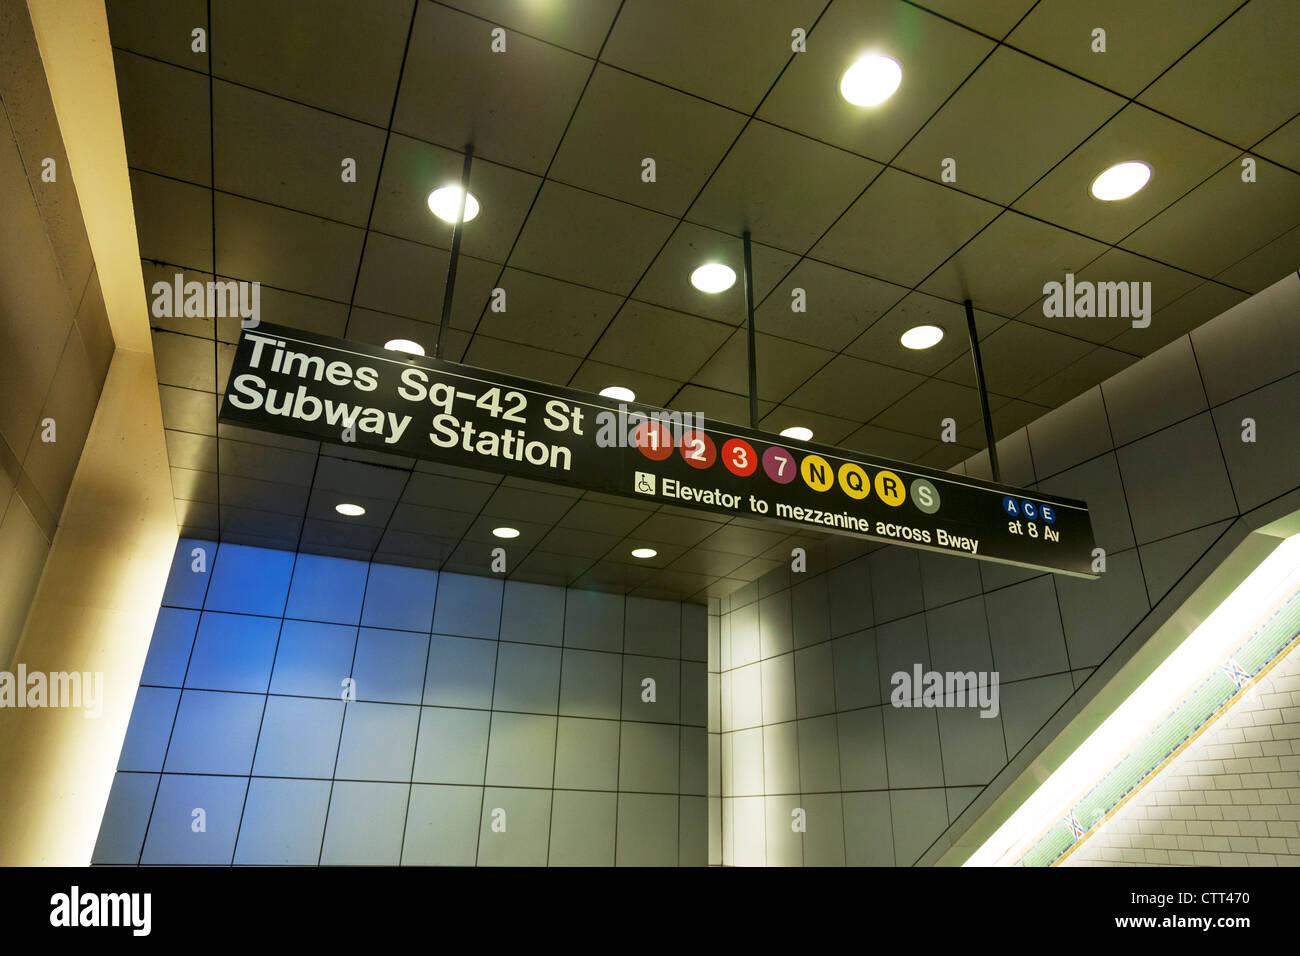 Times Square 42 Street Subway Station Ortseingangsschild New York City, Manhattan Stockbild